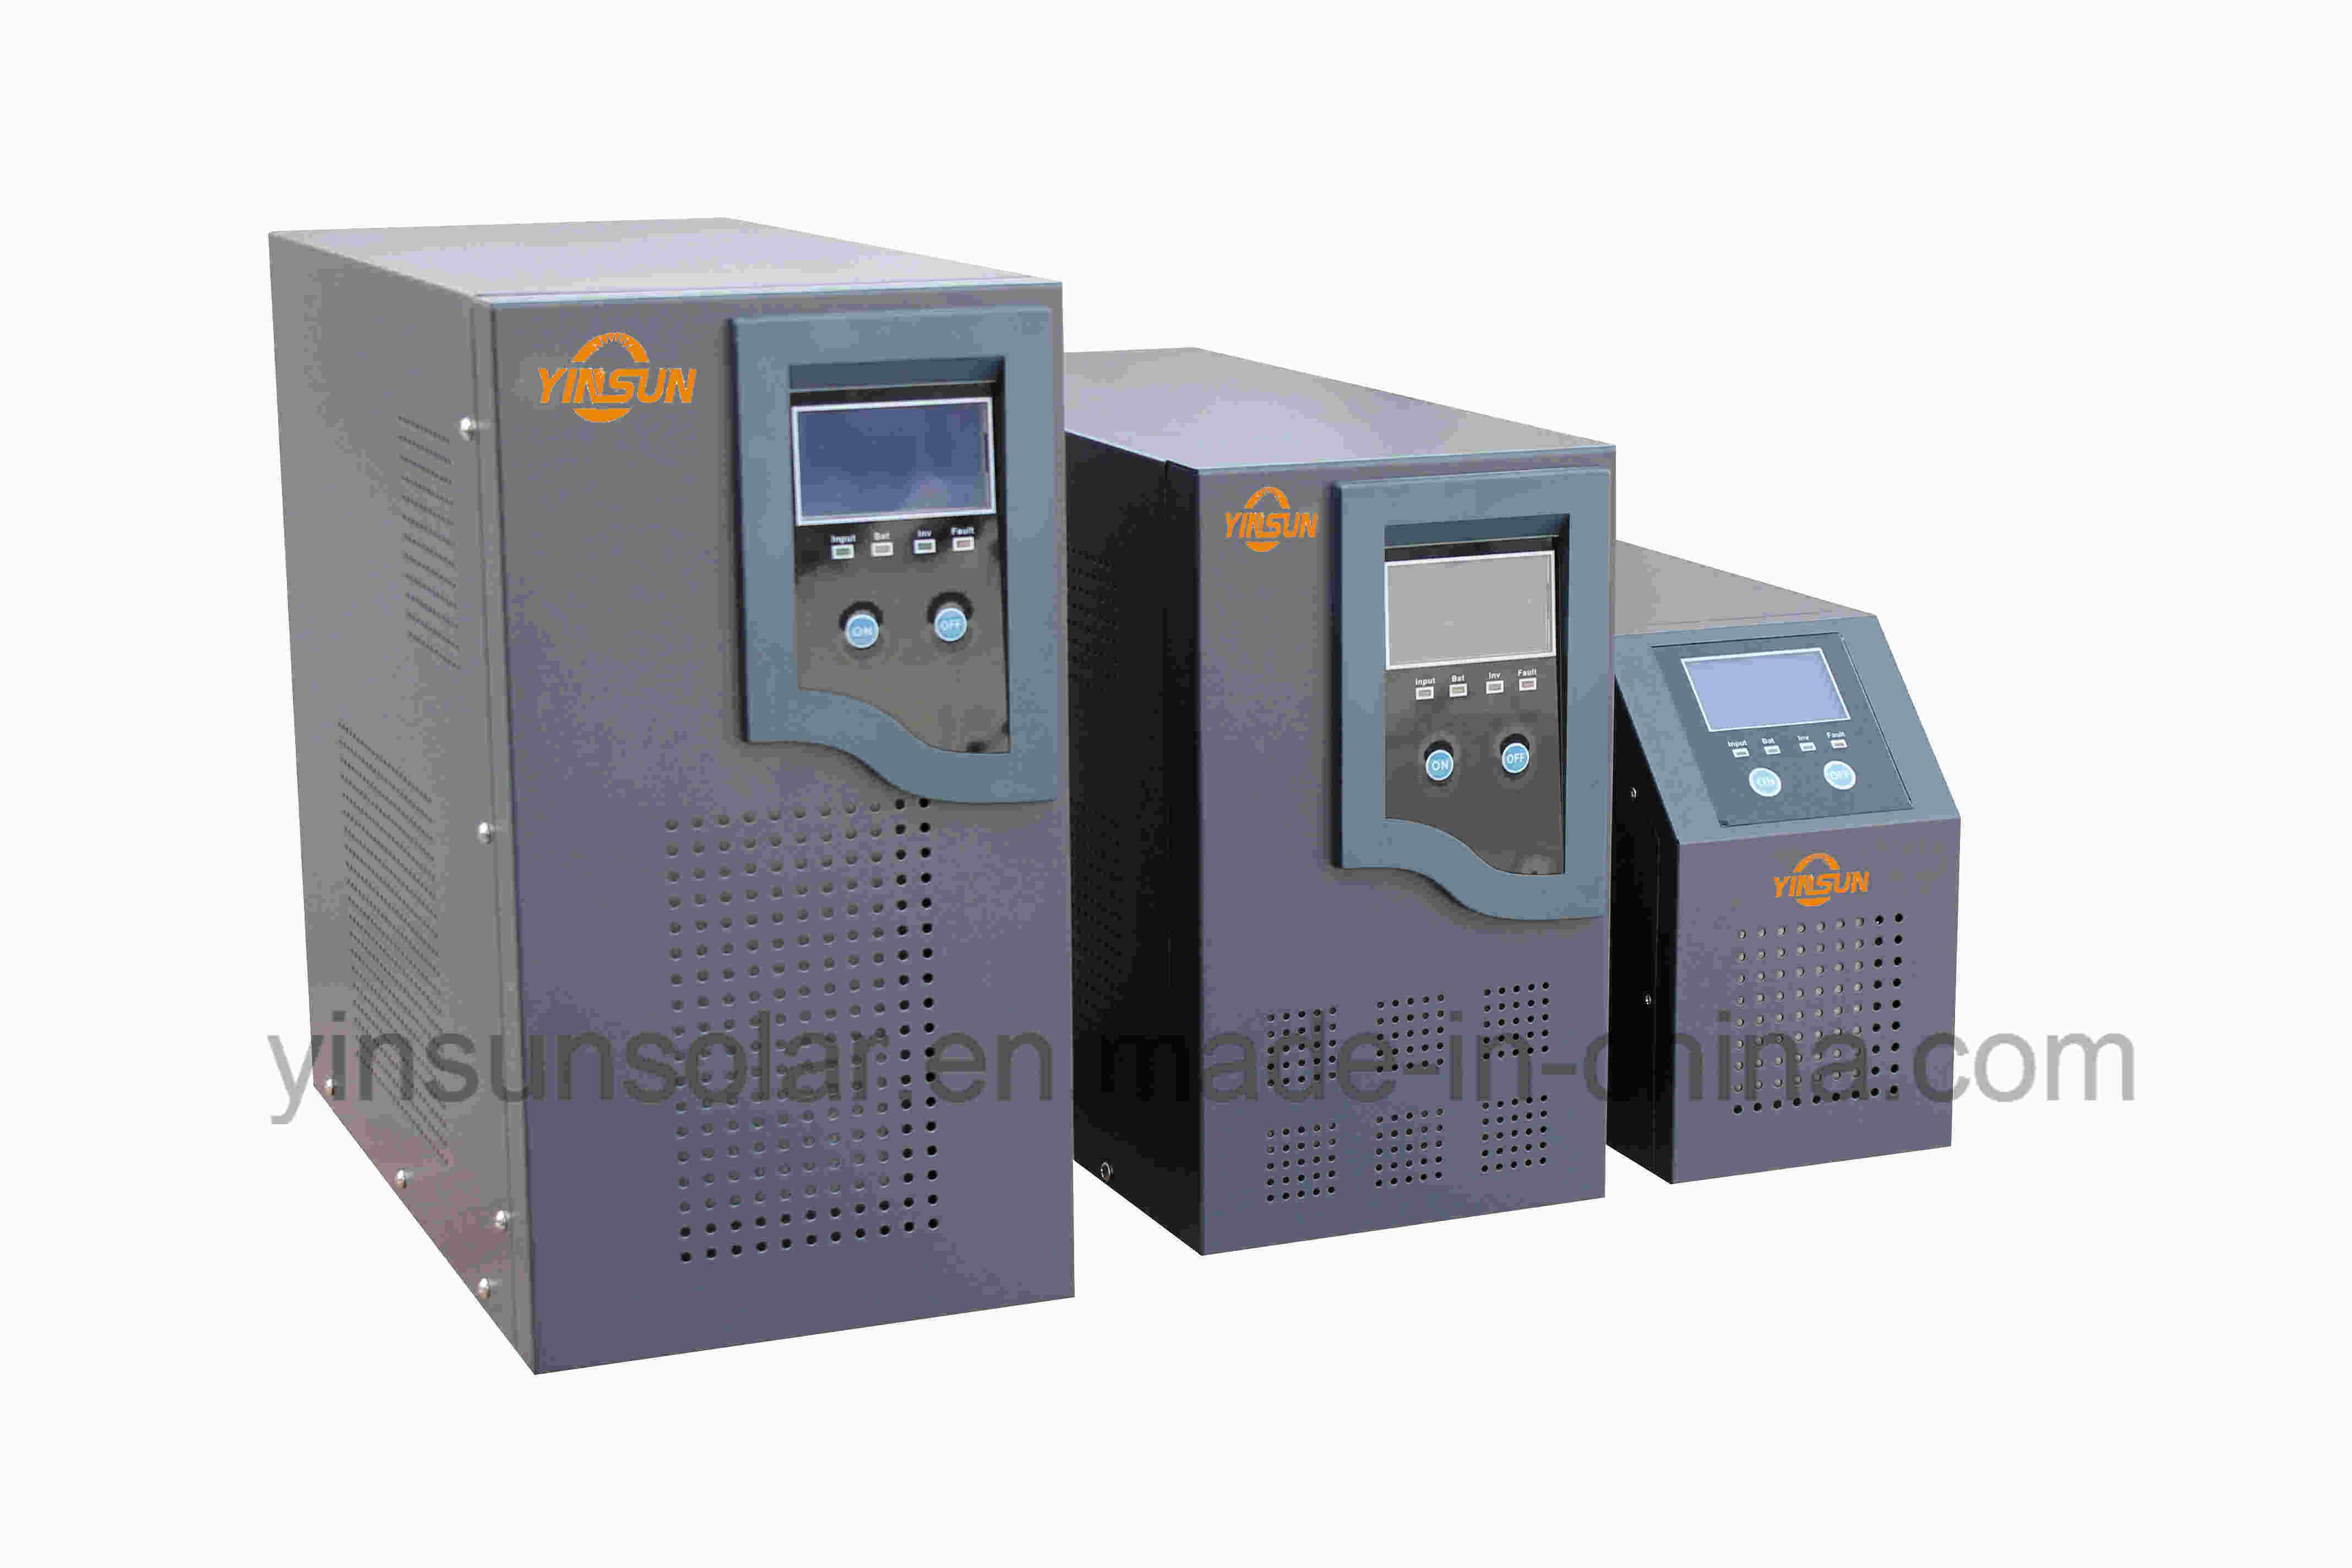 500W-12V Pure Sine Wave Power Inverter for Solar Power System